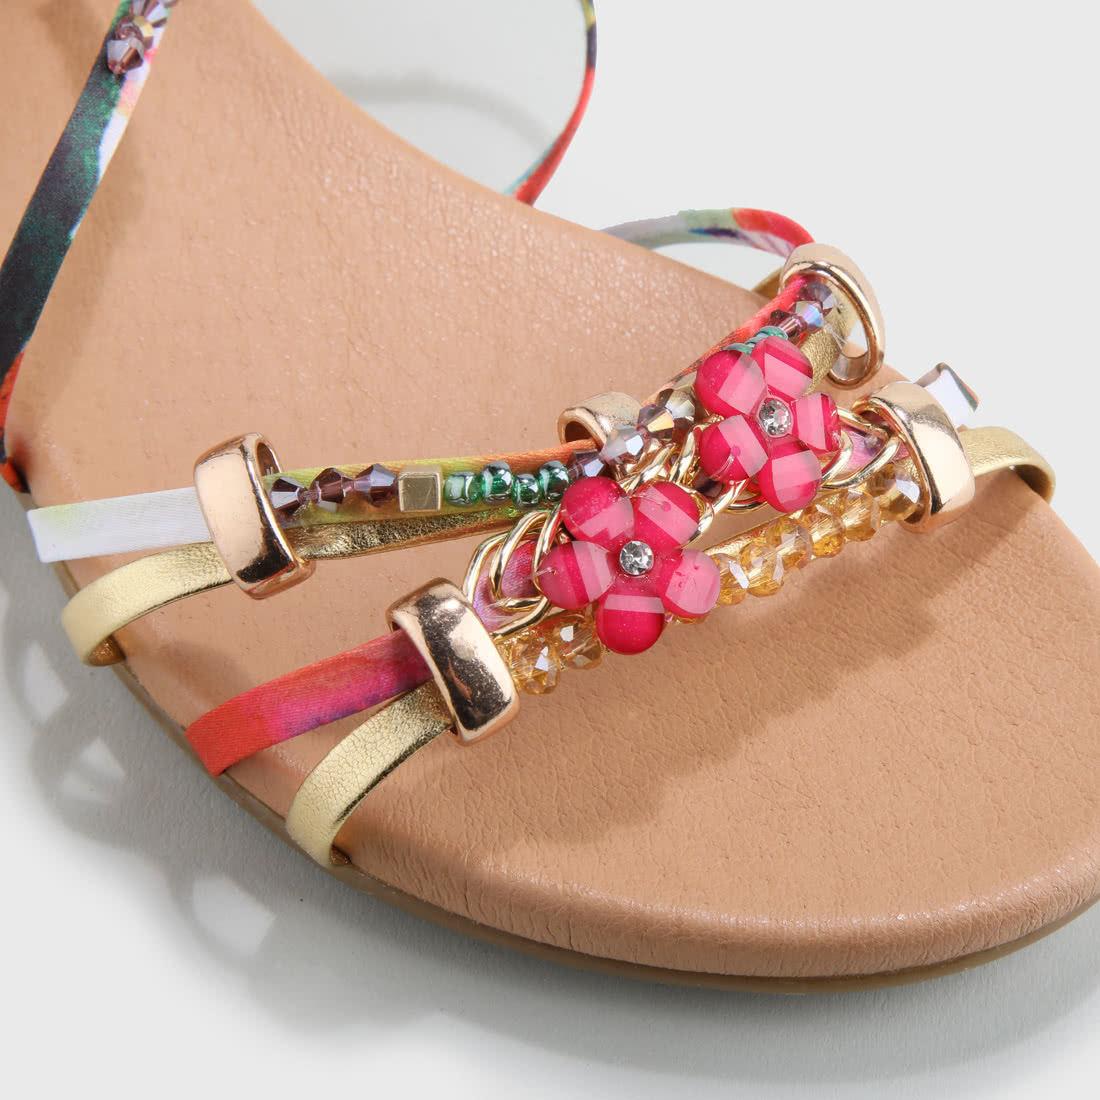 7a9b5943b65 Elora Sandals Suede Look Pink buy online in BUFFALO Online-Shop ...